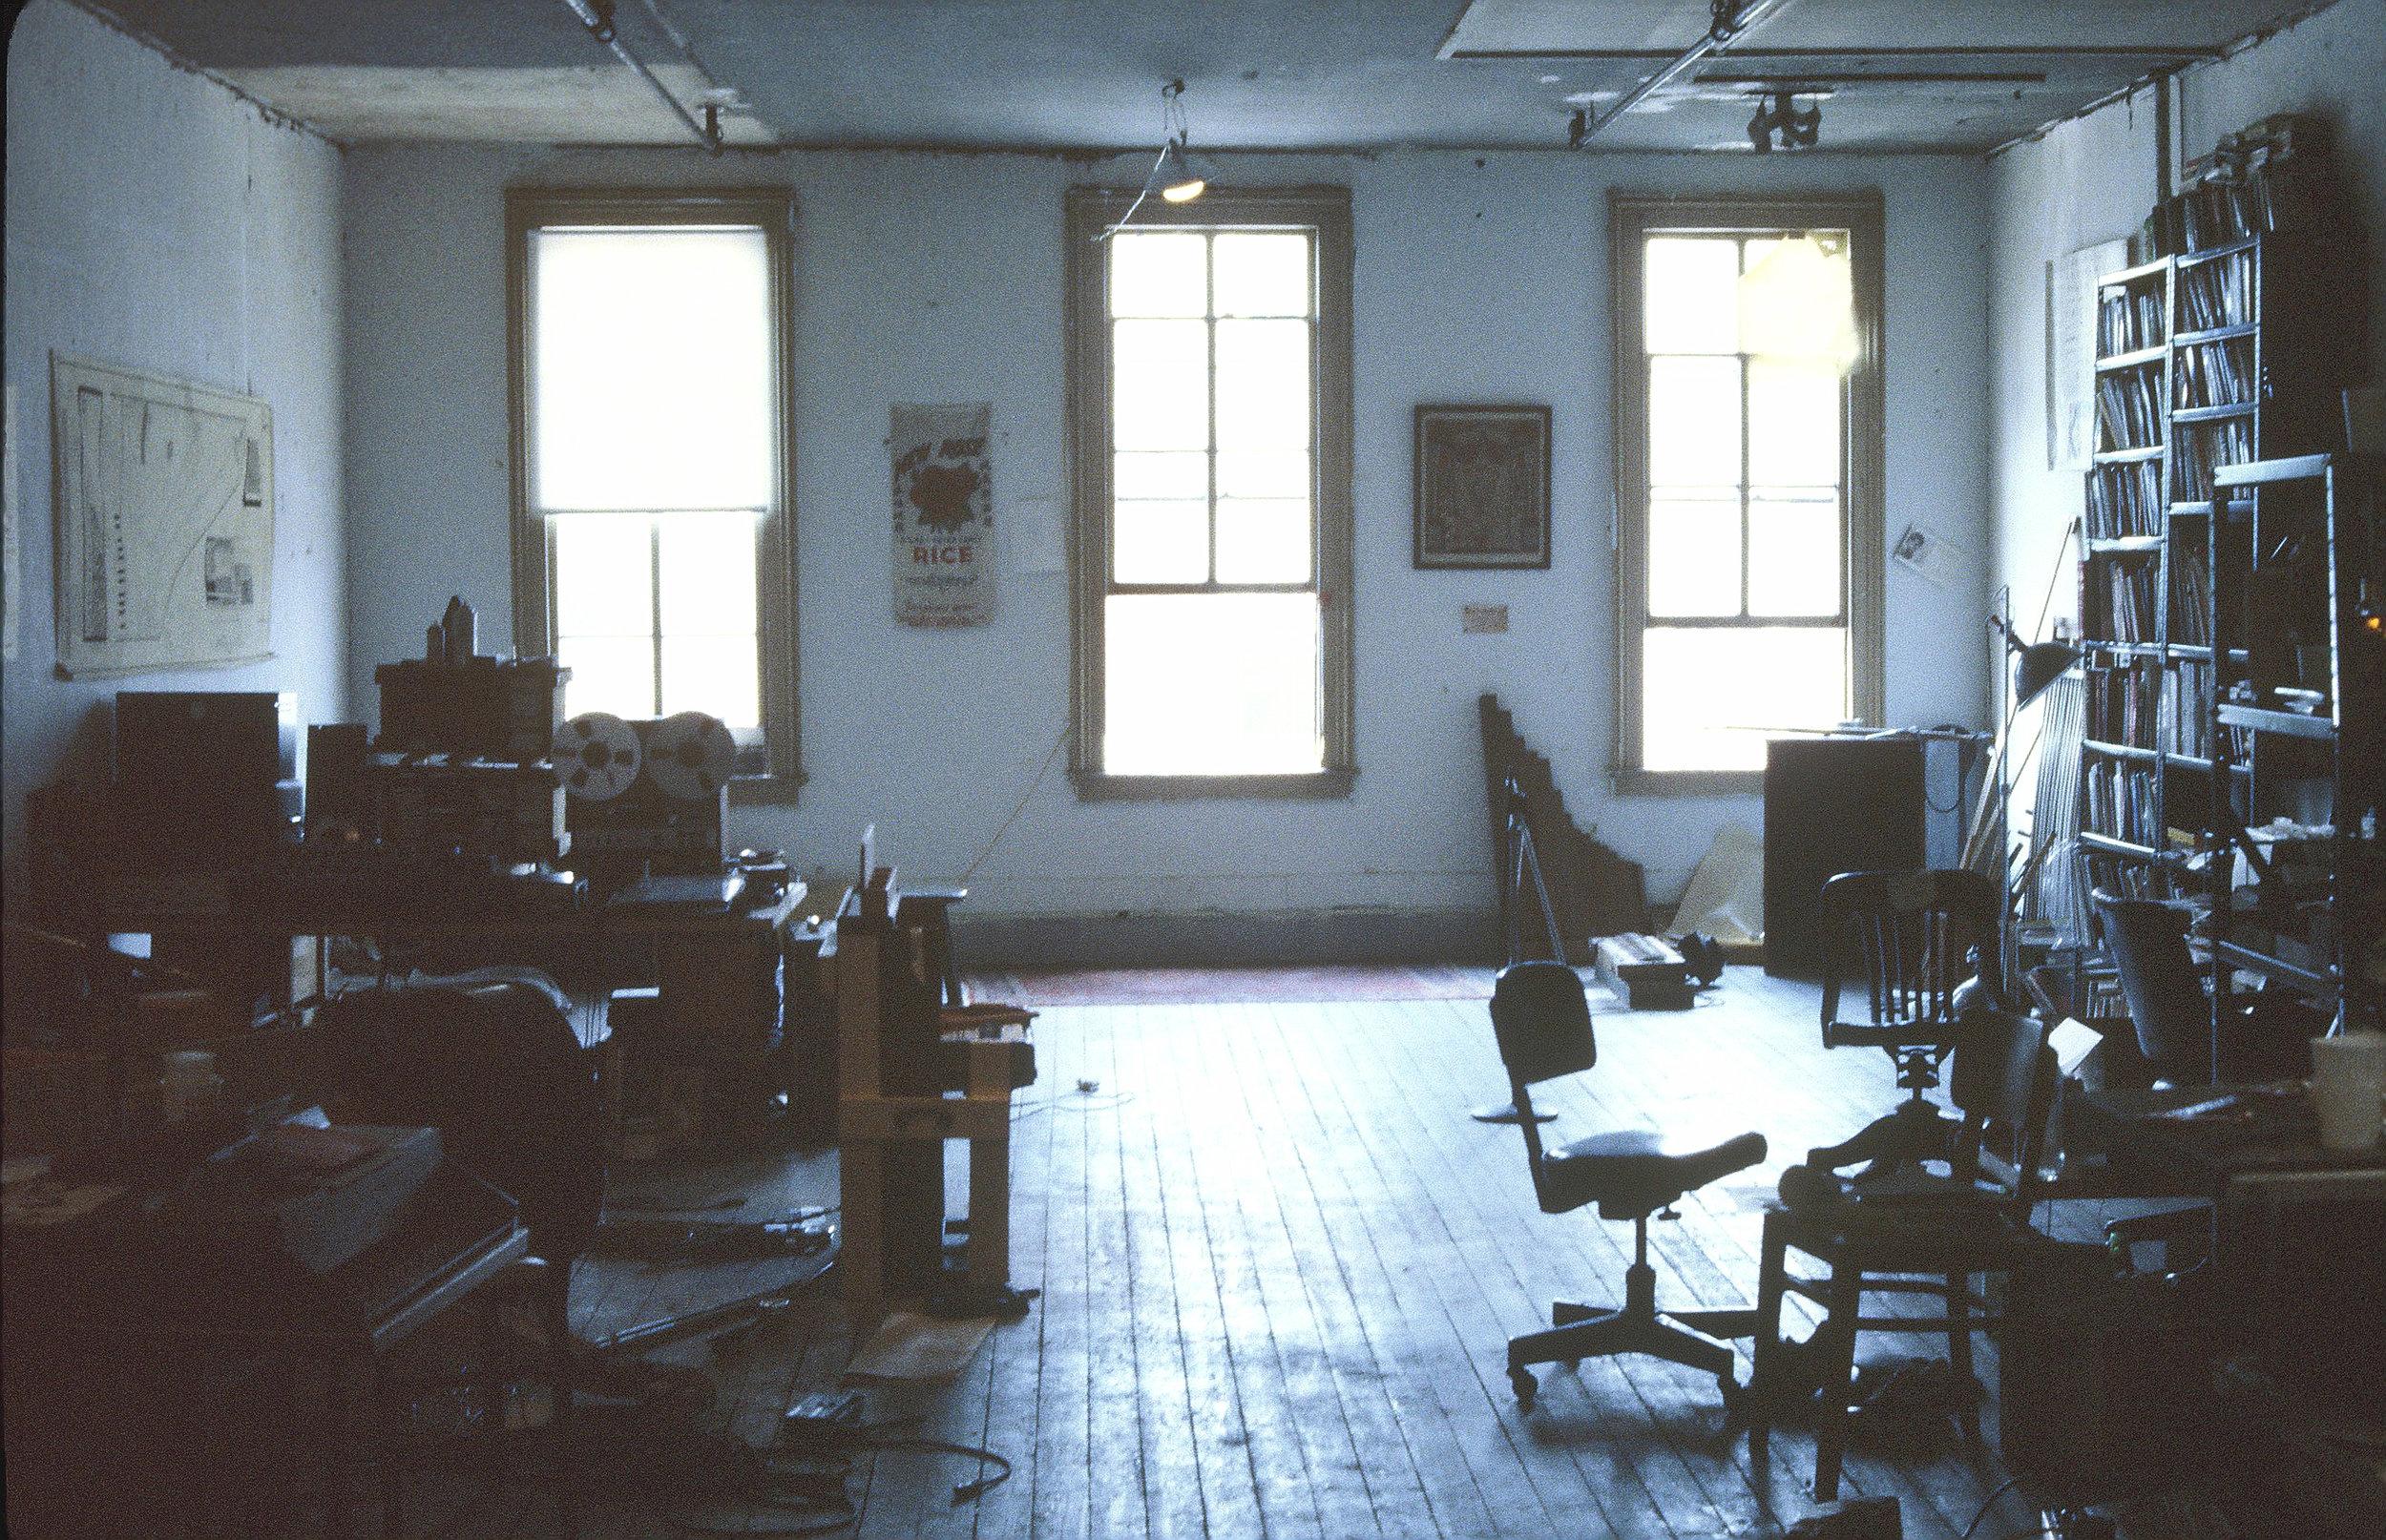 Studio, Middletown Ct., 1981